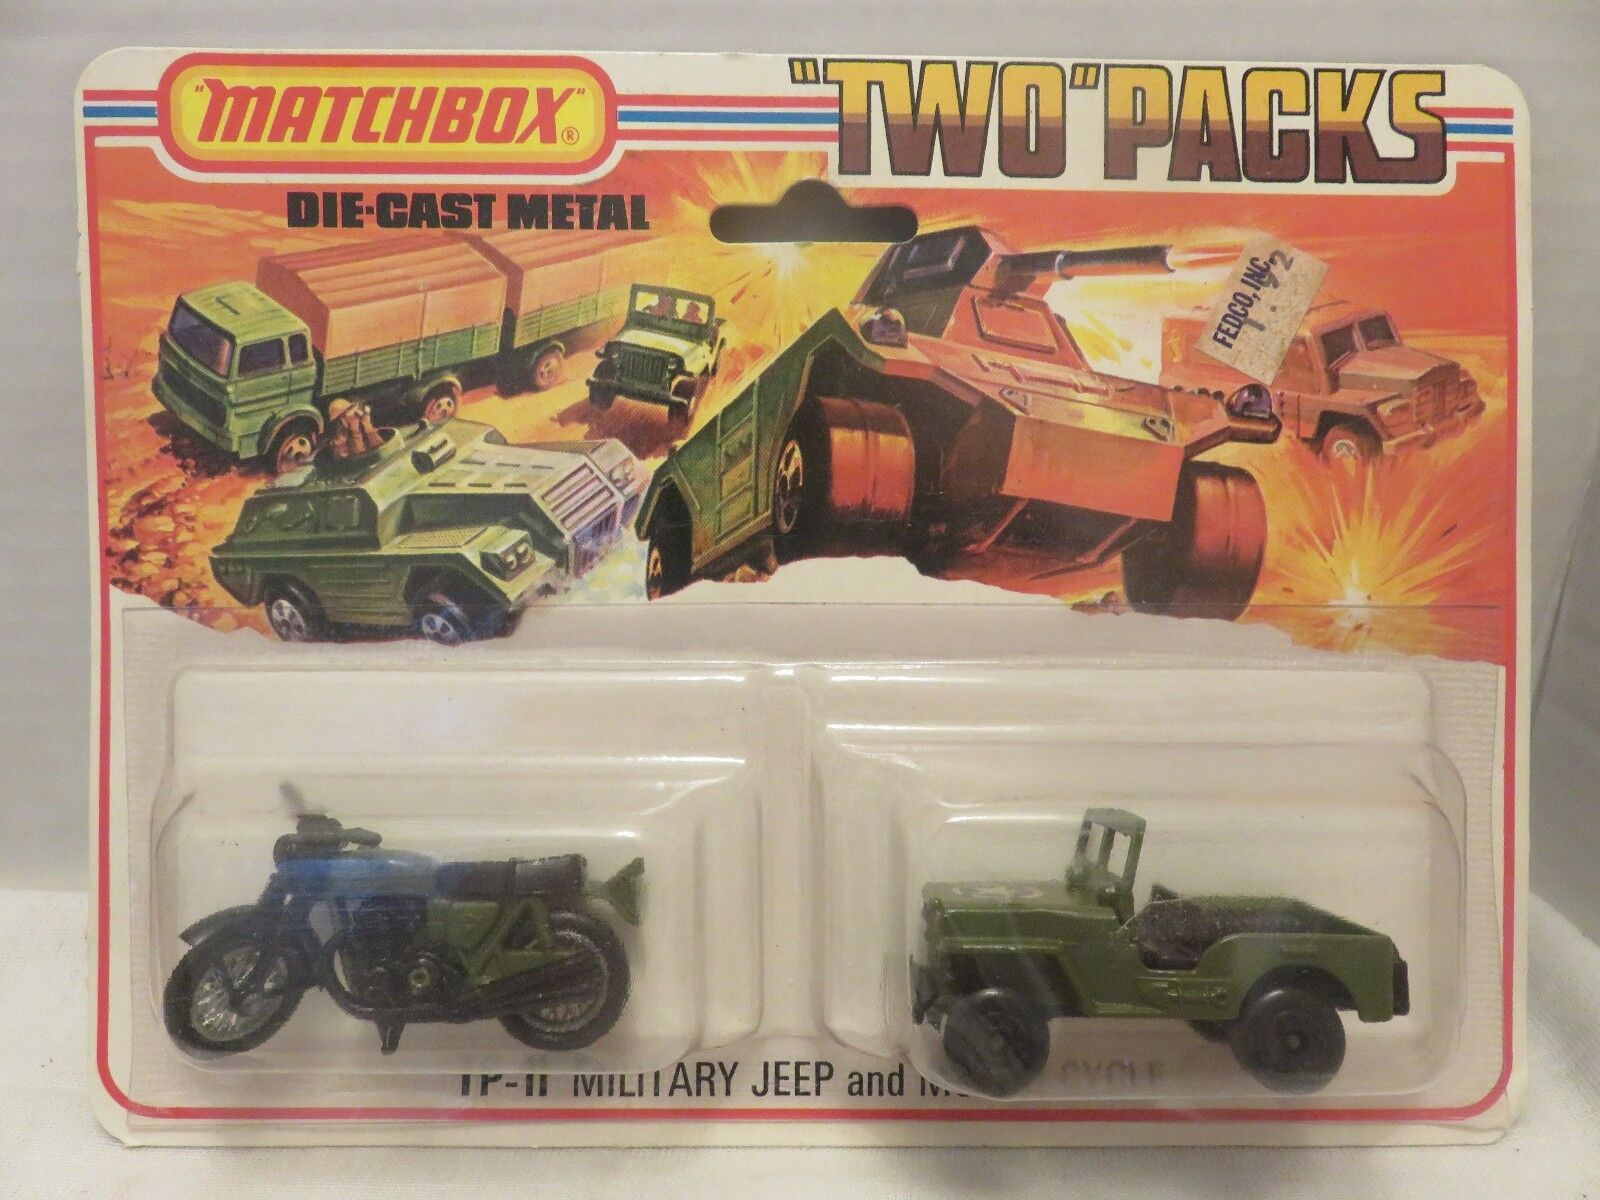 1976 paquetes de dos Matchbox Militar Jeep Motor ciclo TP-11 Die-cast Metal Inglaterra B